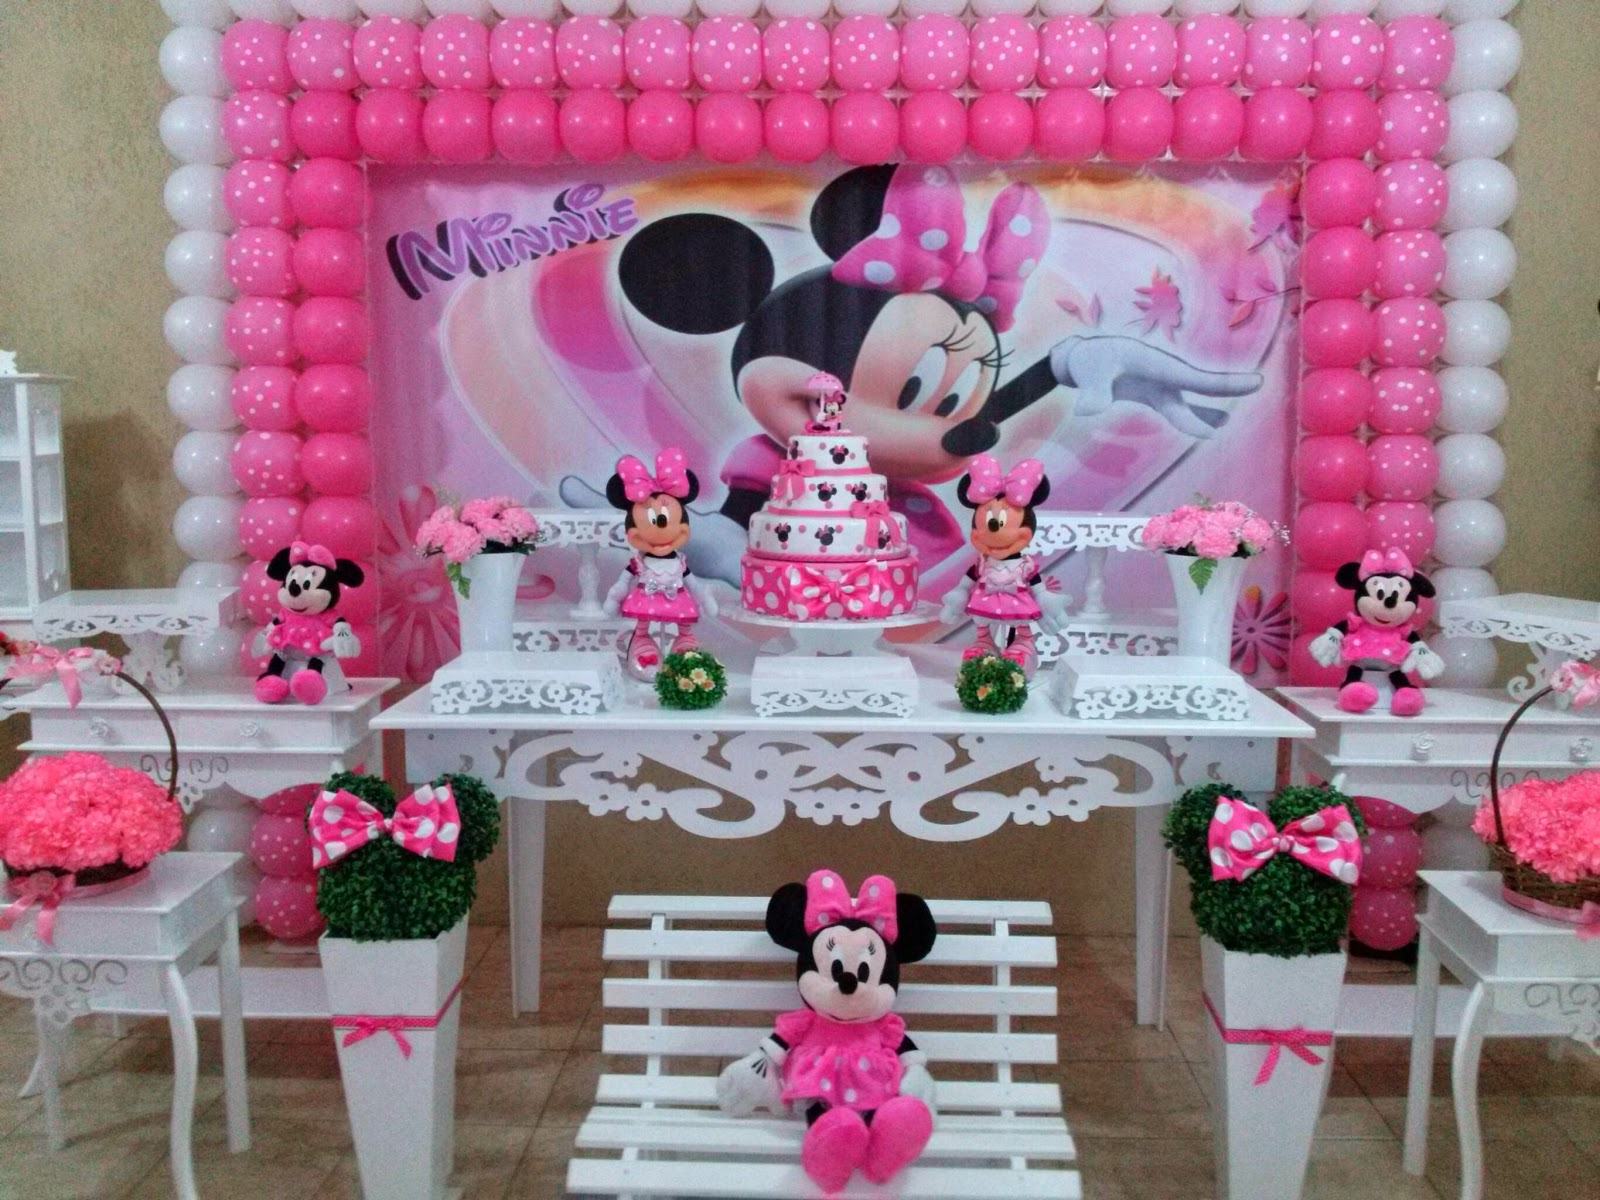 decoracao festa minnie rosa : decoracao festa minnie rosa:Minnie rosa provençal – CIFESTA DECORAÇÕES